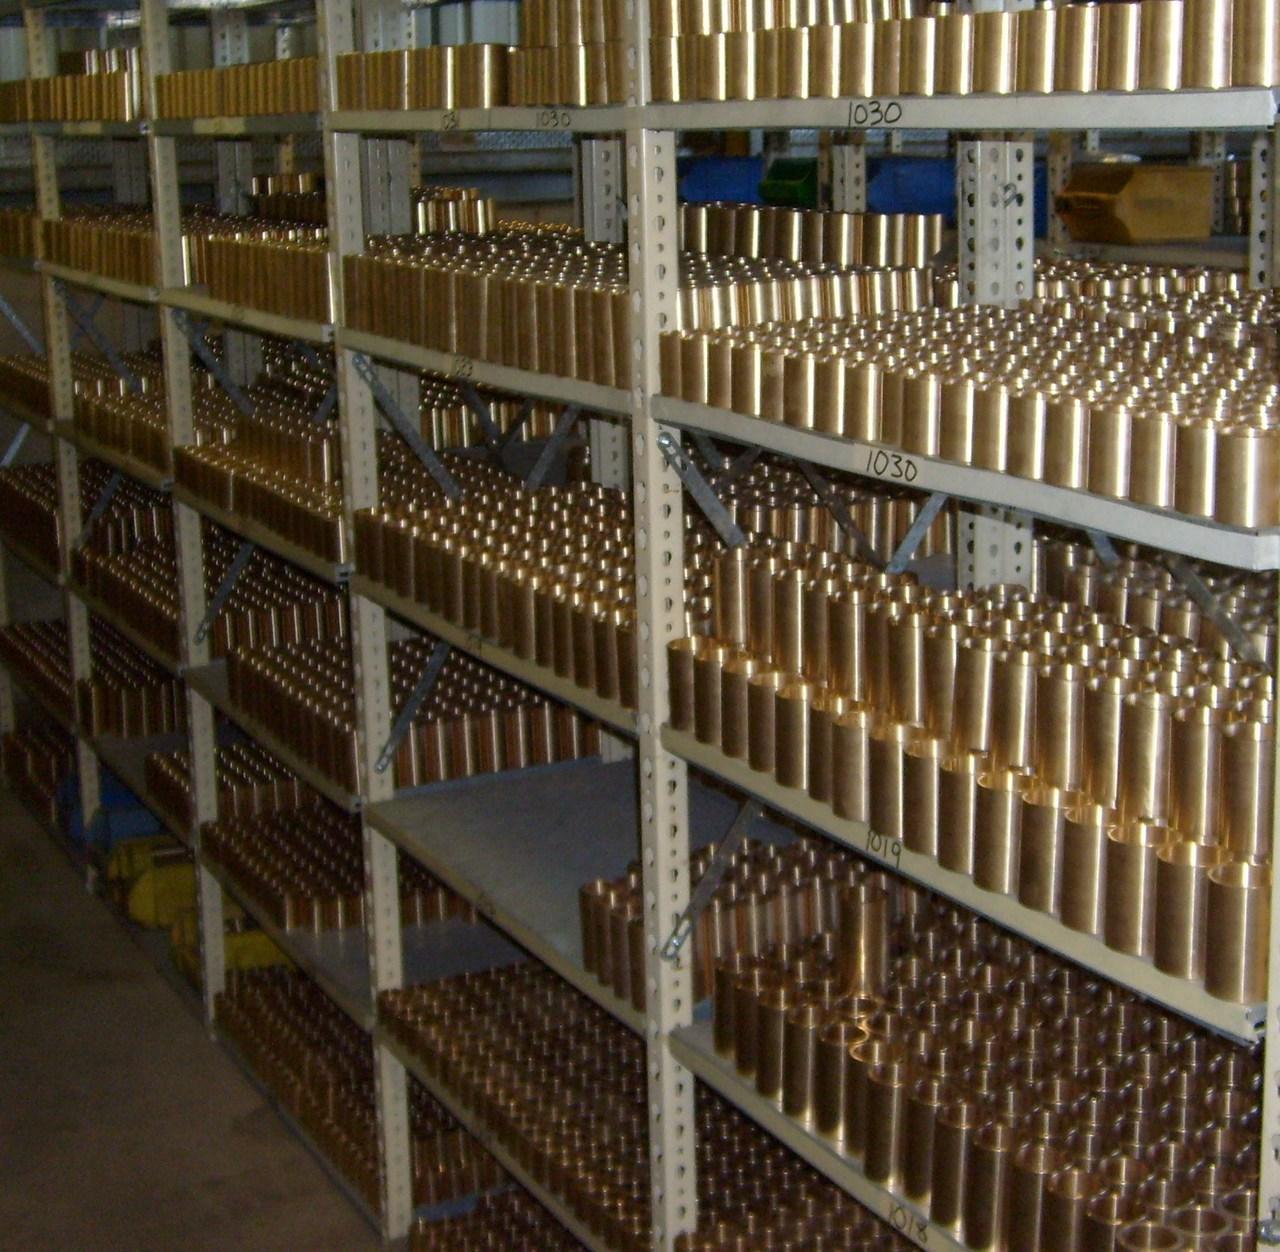 Втулка бронзовая БРАЖ9-4, ОЦС555, БРКМЦ, БрО10Ф1 под заказ от 5 до 7 дней.